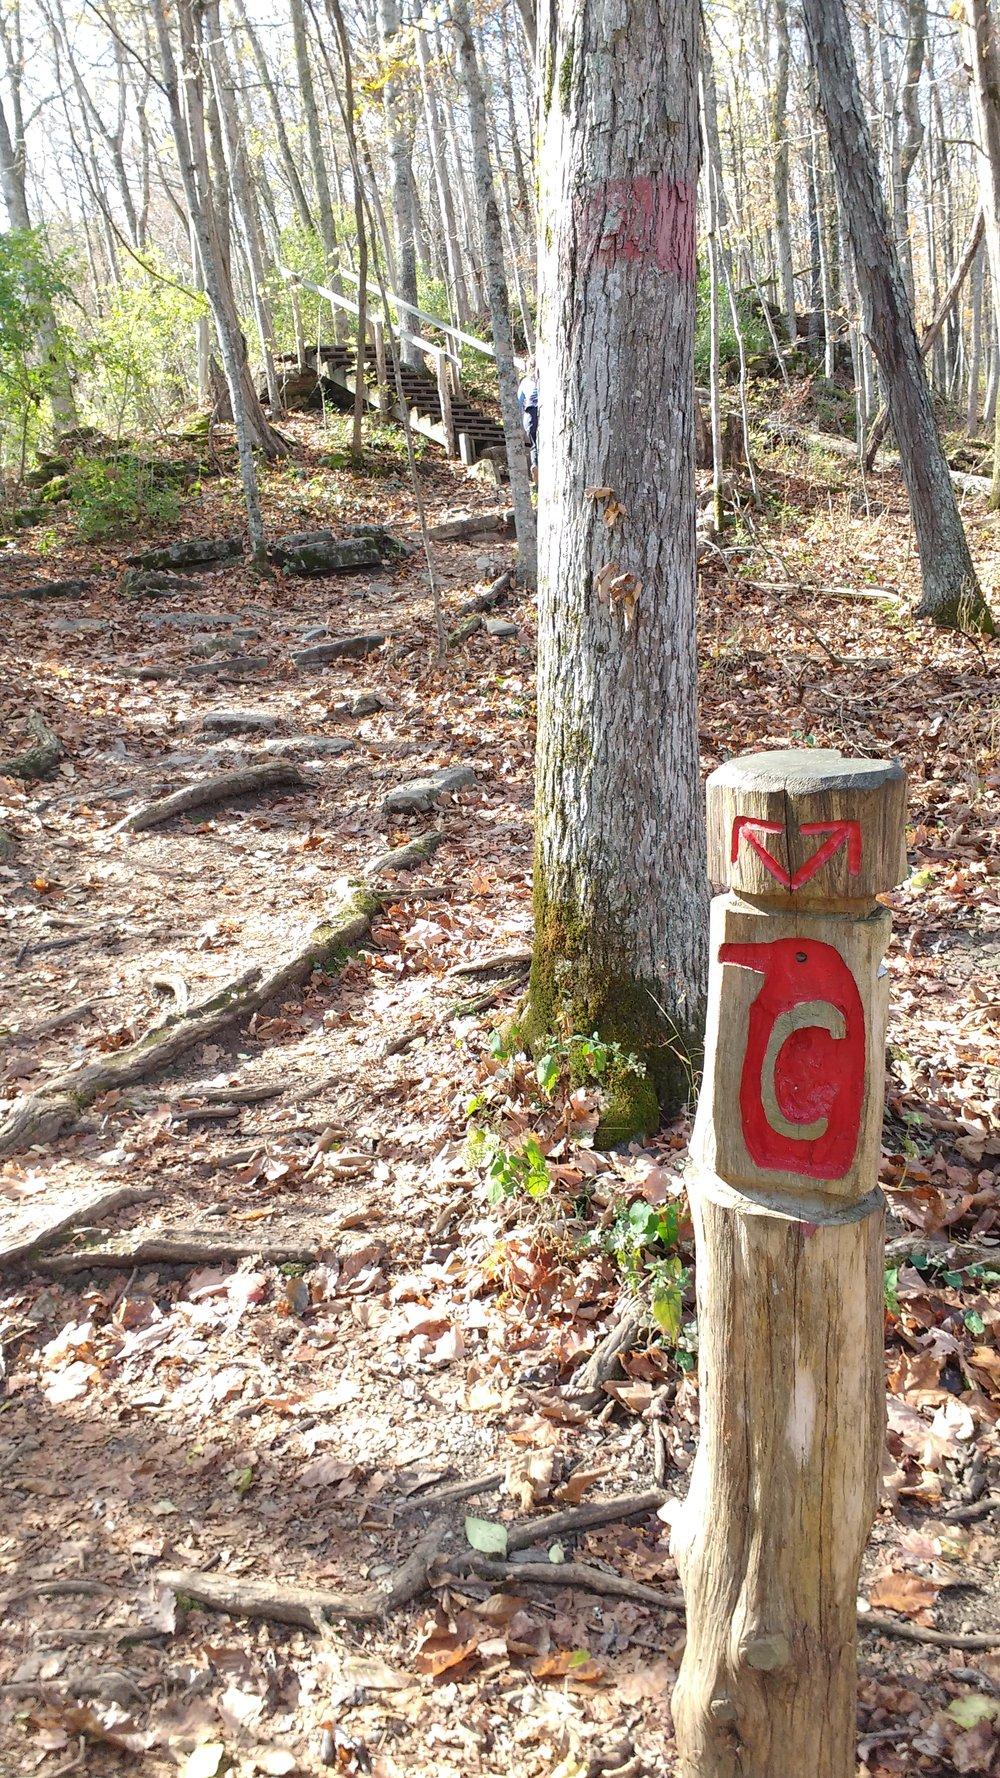 Trail marker at Raven Run Nature Sanctuary